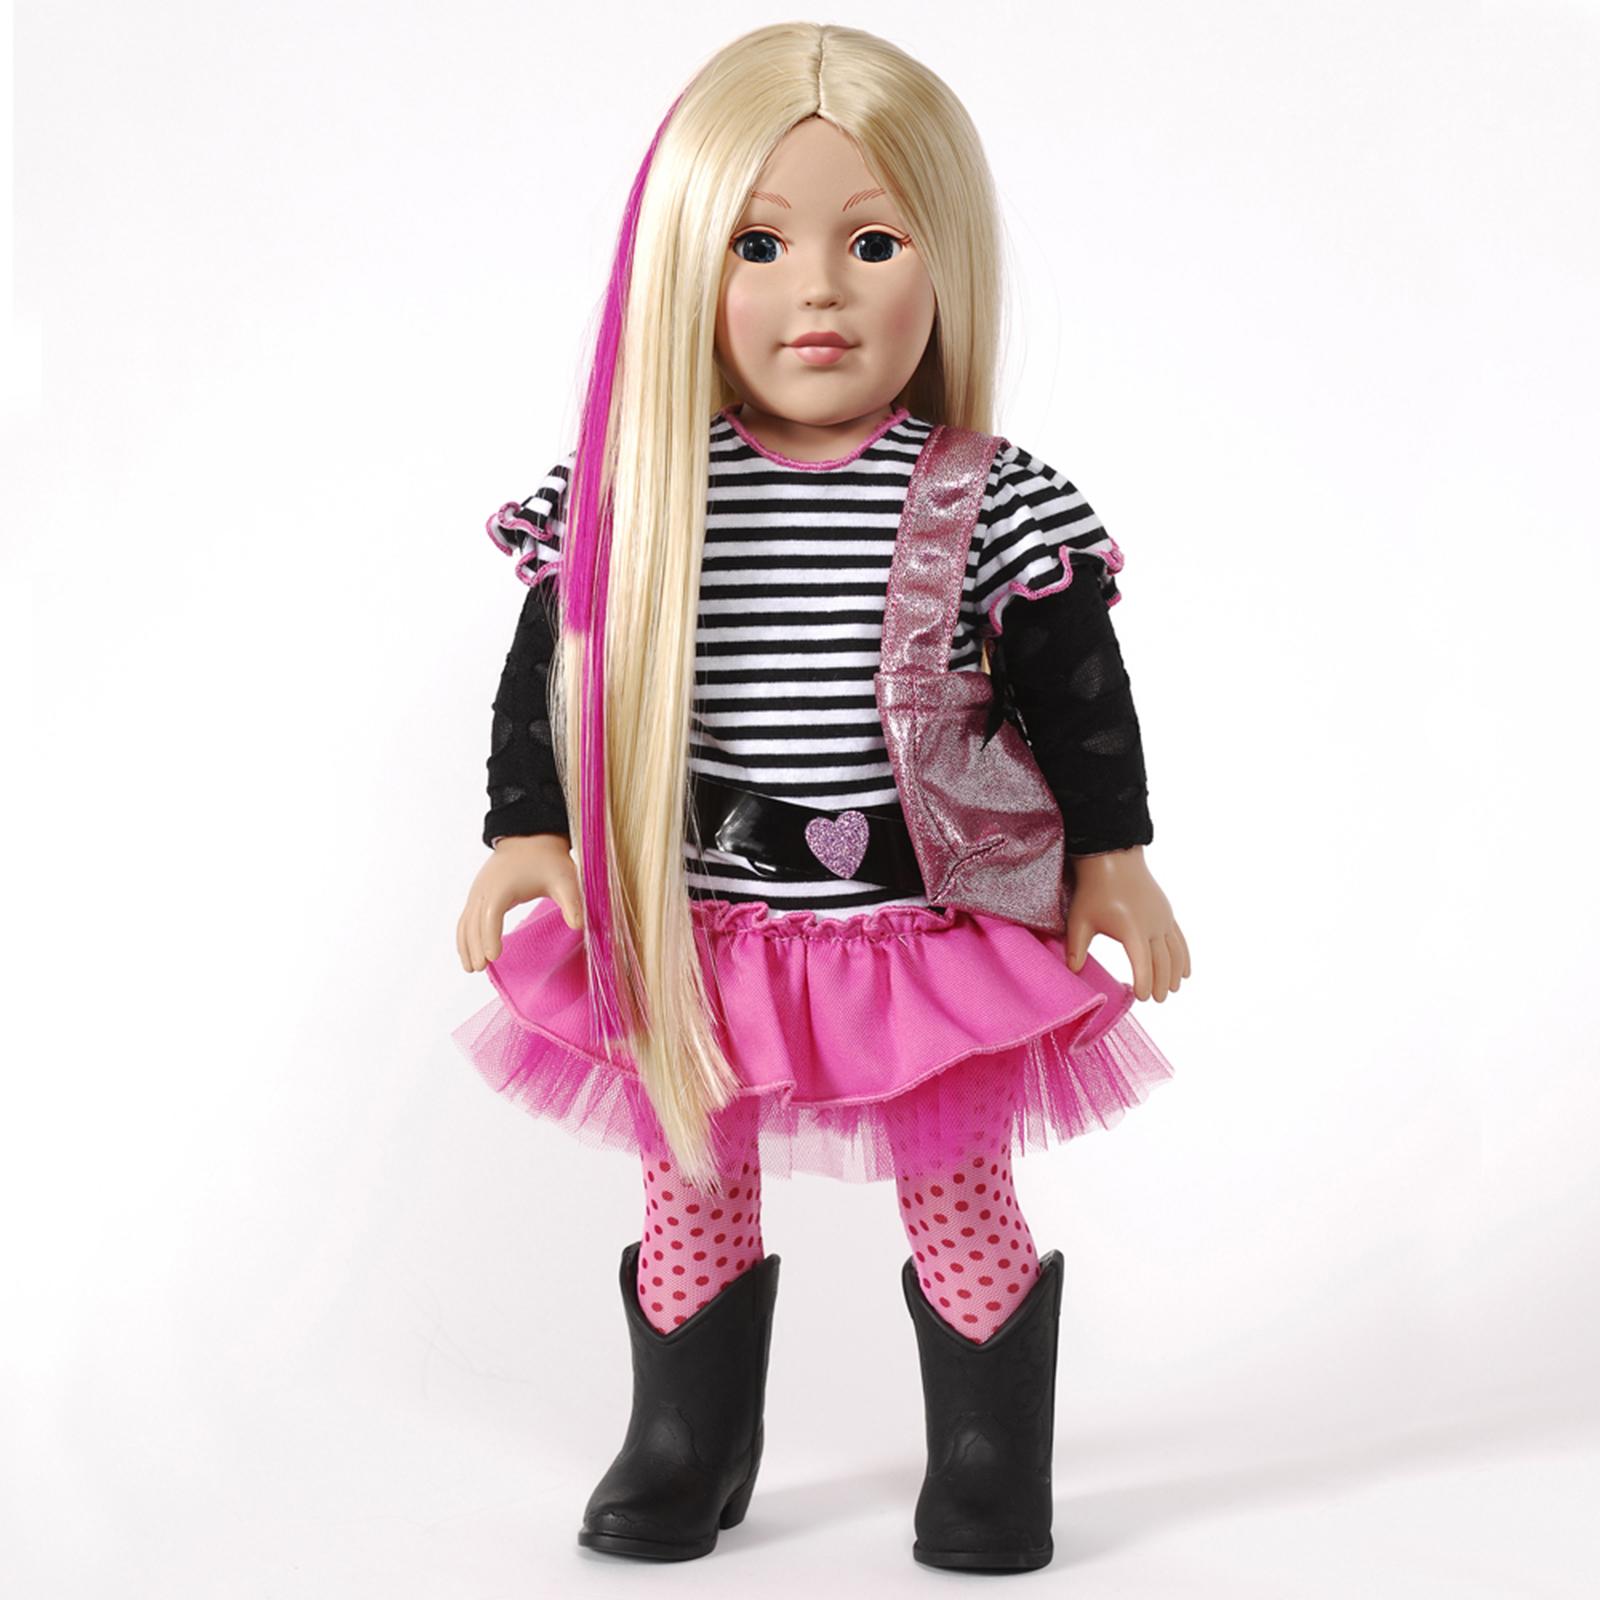 18 Blue Eyed Blonde Doll Kmart Exclusive